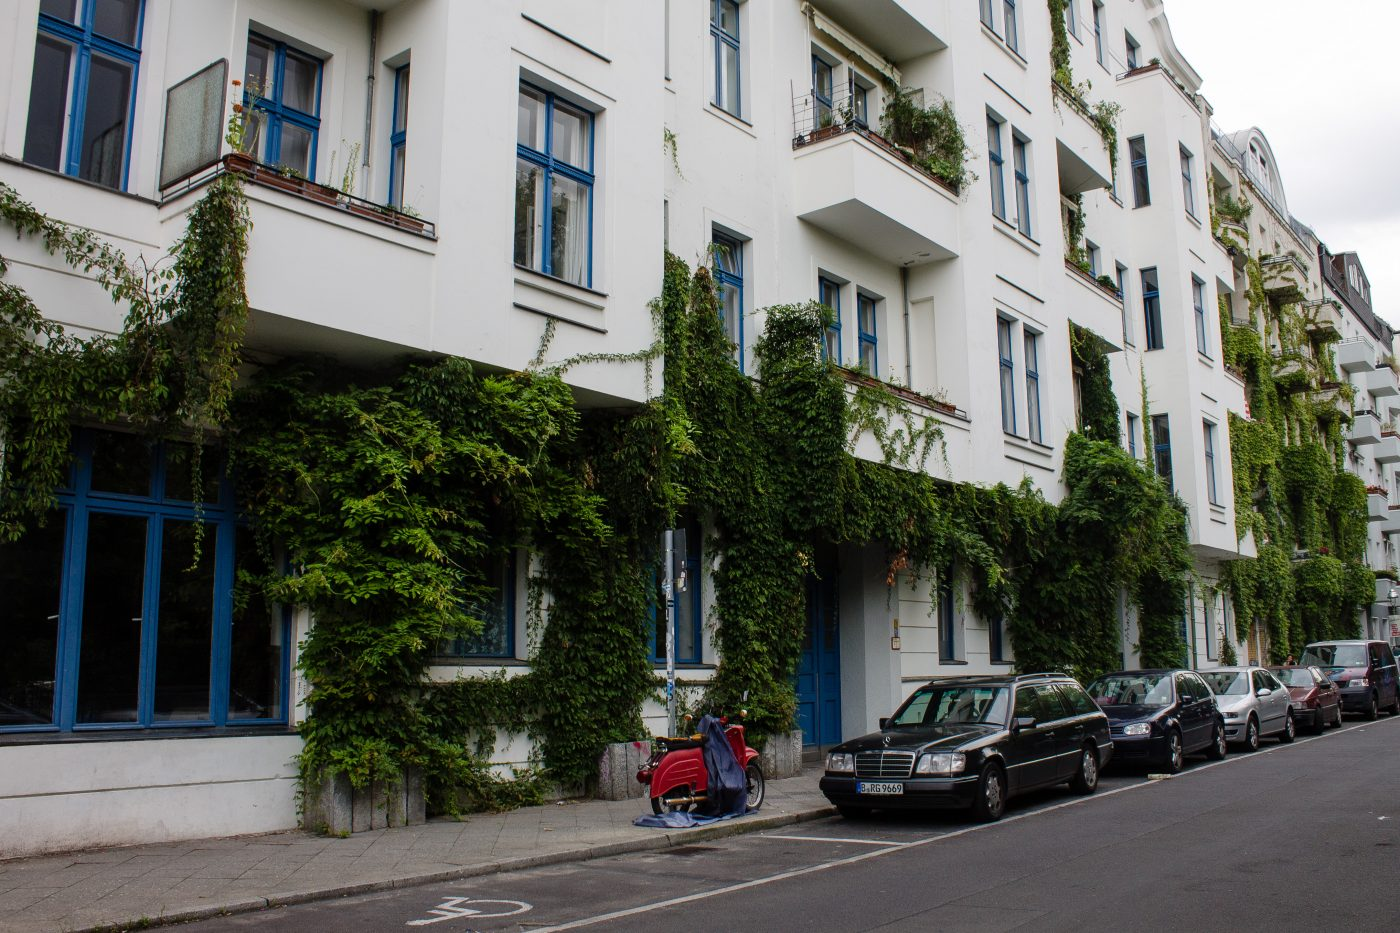 Neukoln, Berlin. Berlin, Germany Contributed by Sam from Alternative Travelers